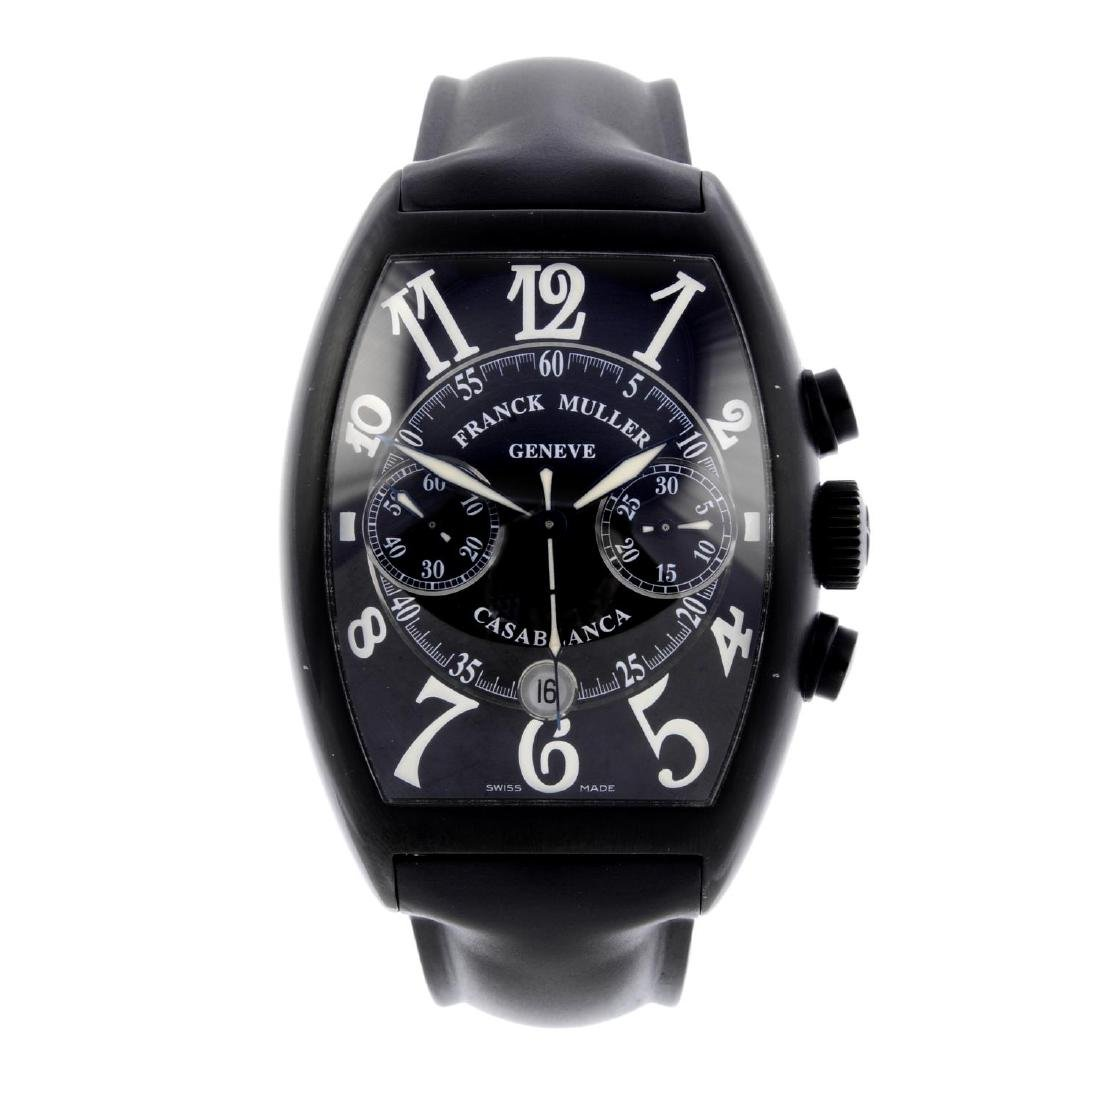 FRANCK MULLER - a gentleman's Casablanca chronograph